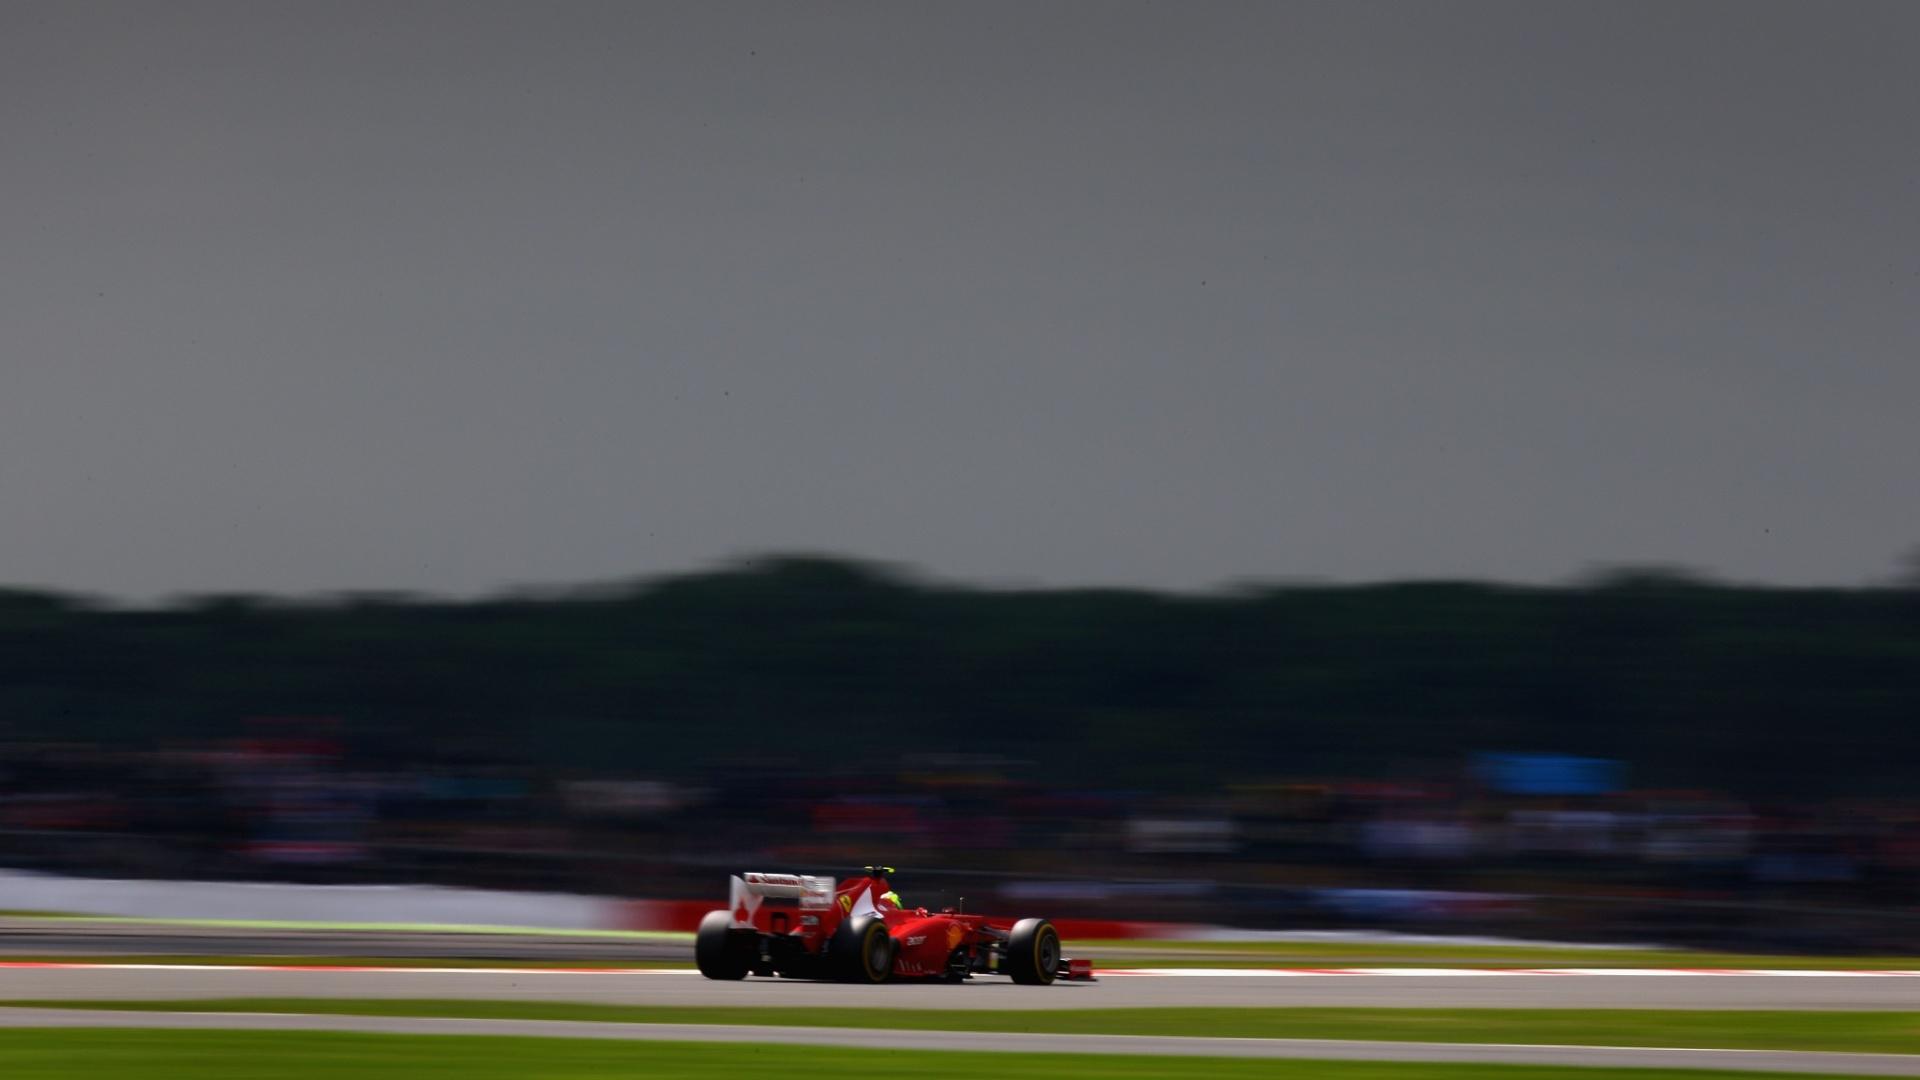 Felipe Massa guia seu carro pelo circuito de Silverstone